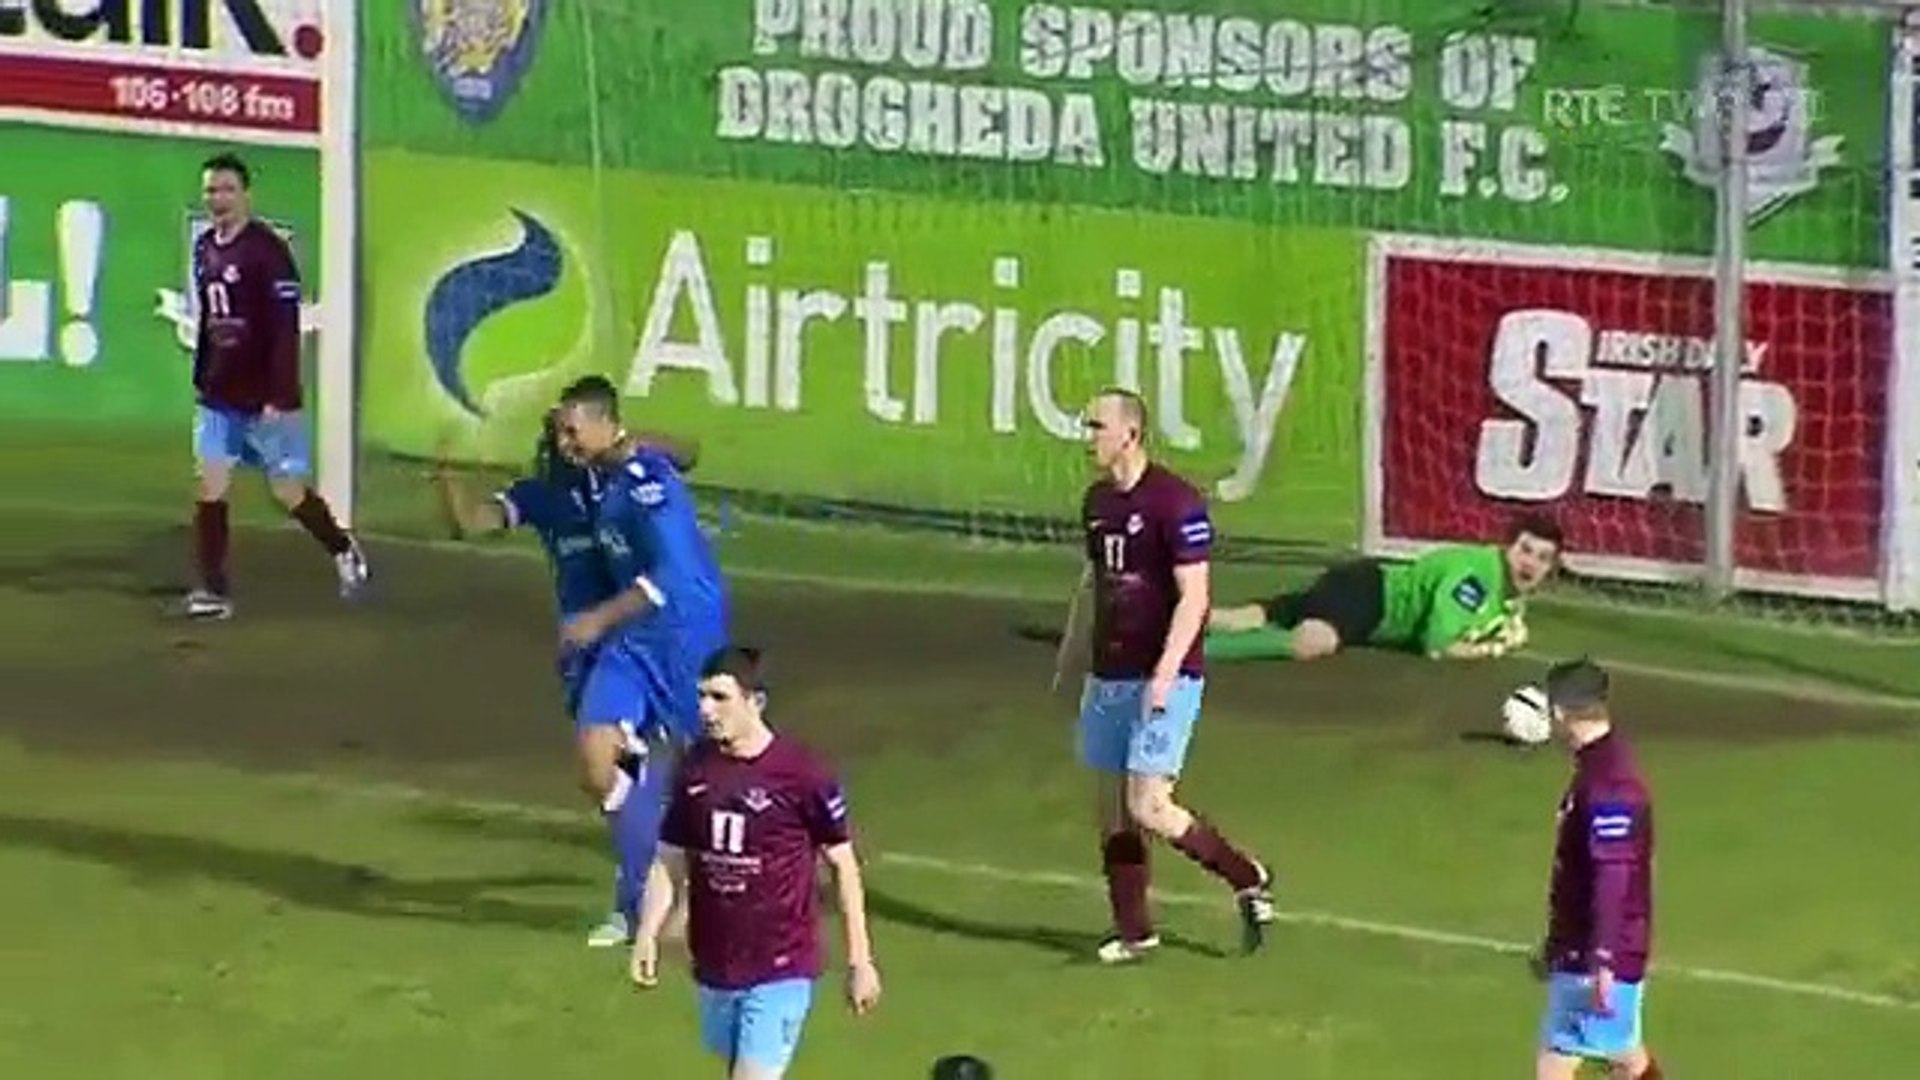 Drogheda United 2-2 Limerick - 15th March 2013